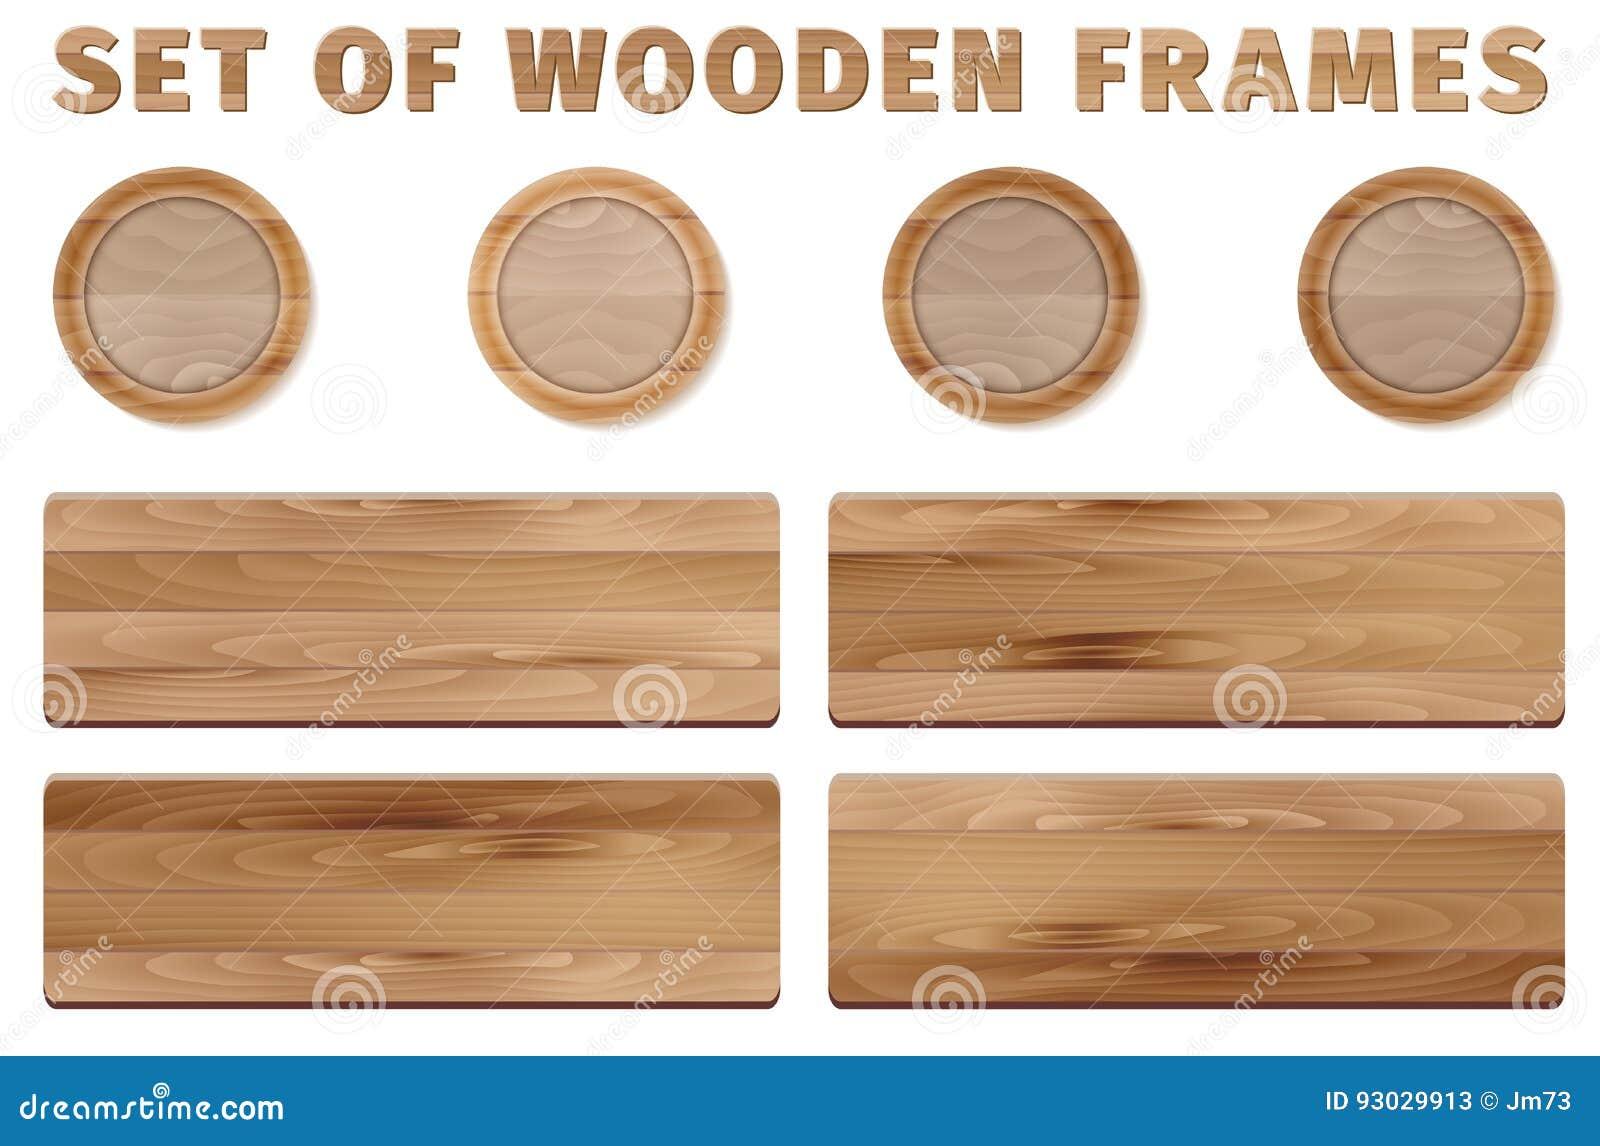 Wood frames set free vector - Background Circle Illustration Set Vector White Wooden